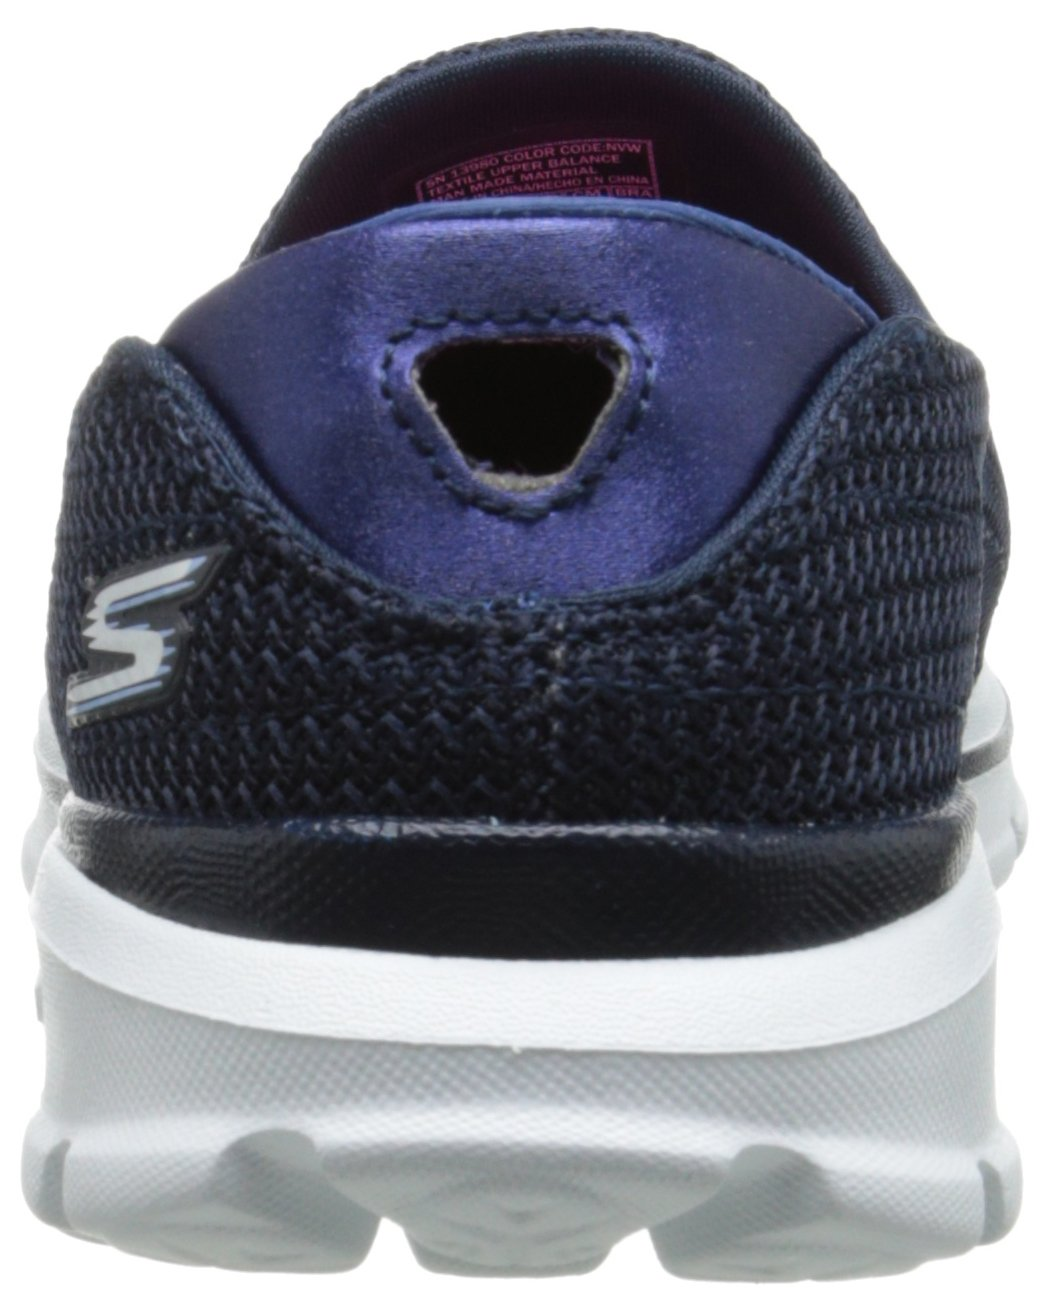 Skechers Performance Women's Walking Go Walk 3 Slip-On Walking Women's Shoe B00L4INIOM 9 B(M) US|Navy/White e84892